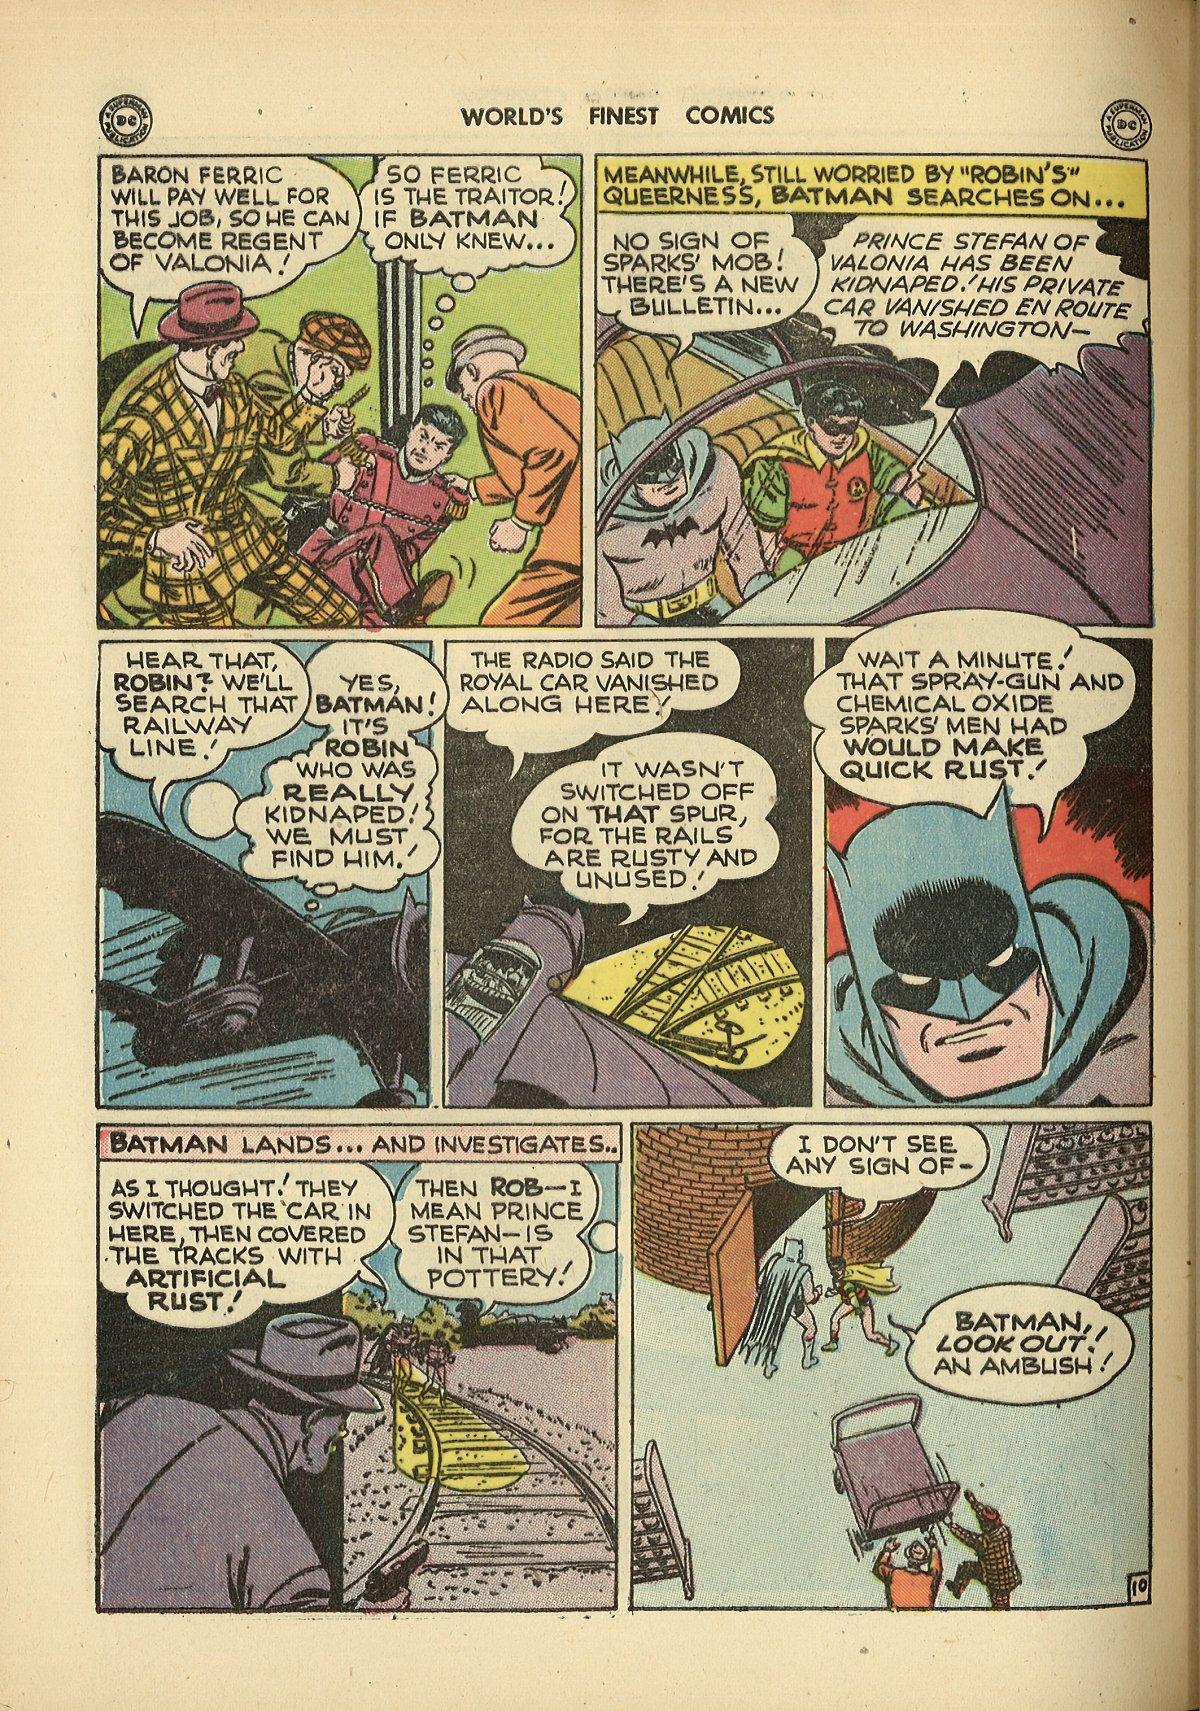 Read online World's Finest Comics comic -  Issue #26 - 70